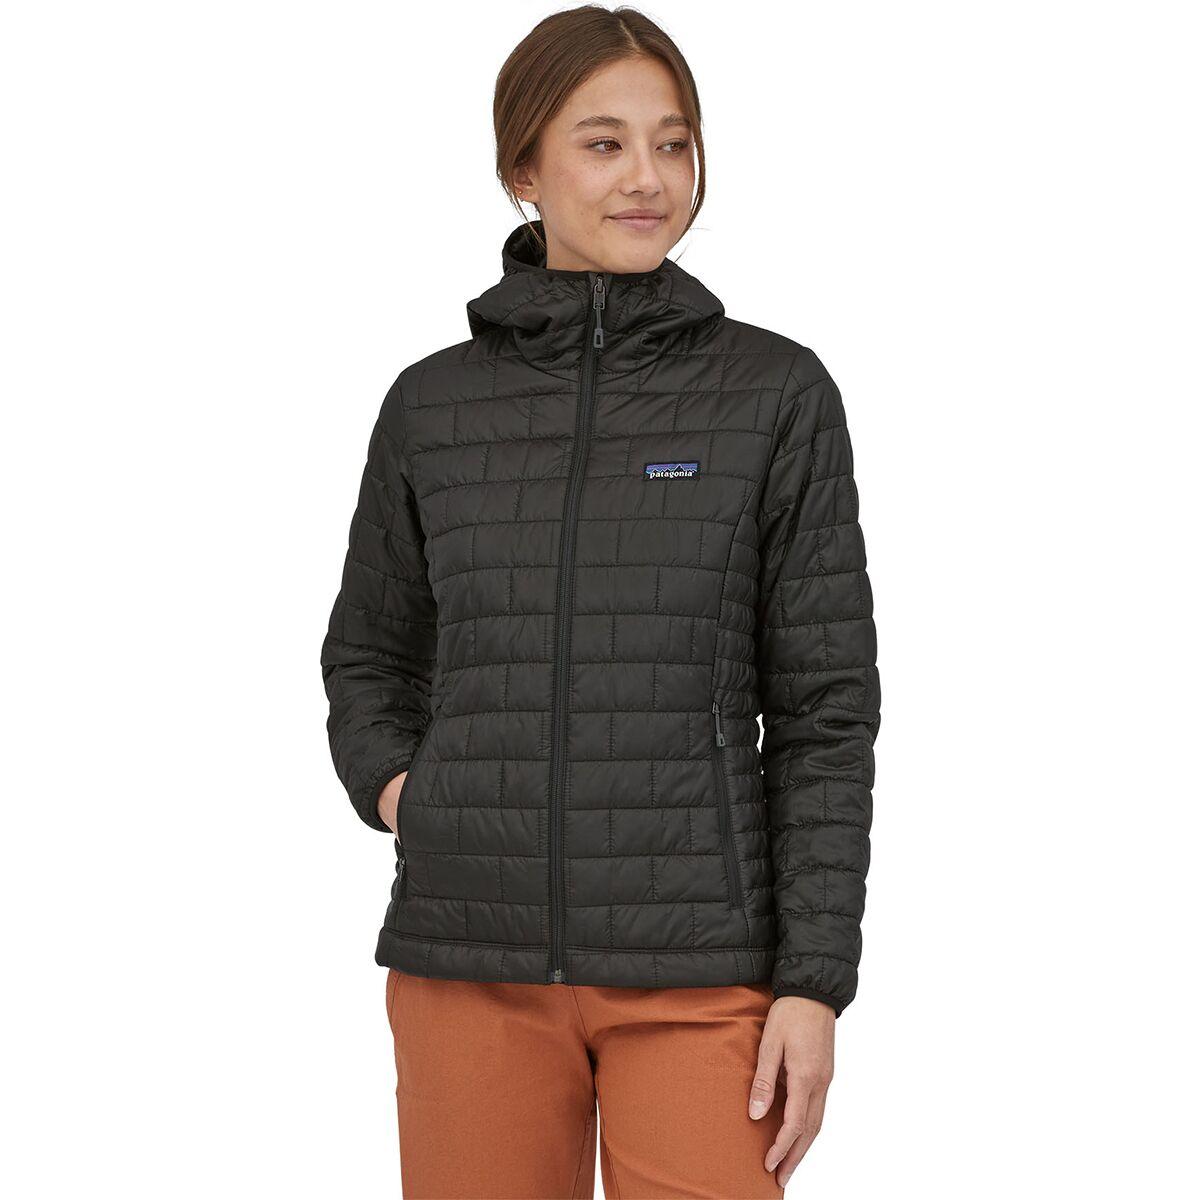 Patagonia Nano Puff Hooded Insulated Jacket - Women